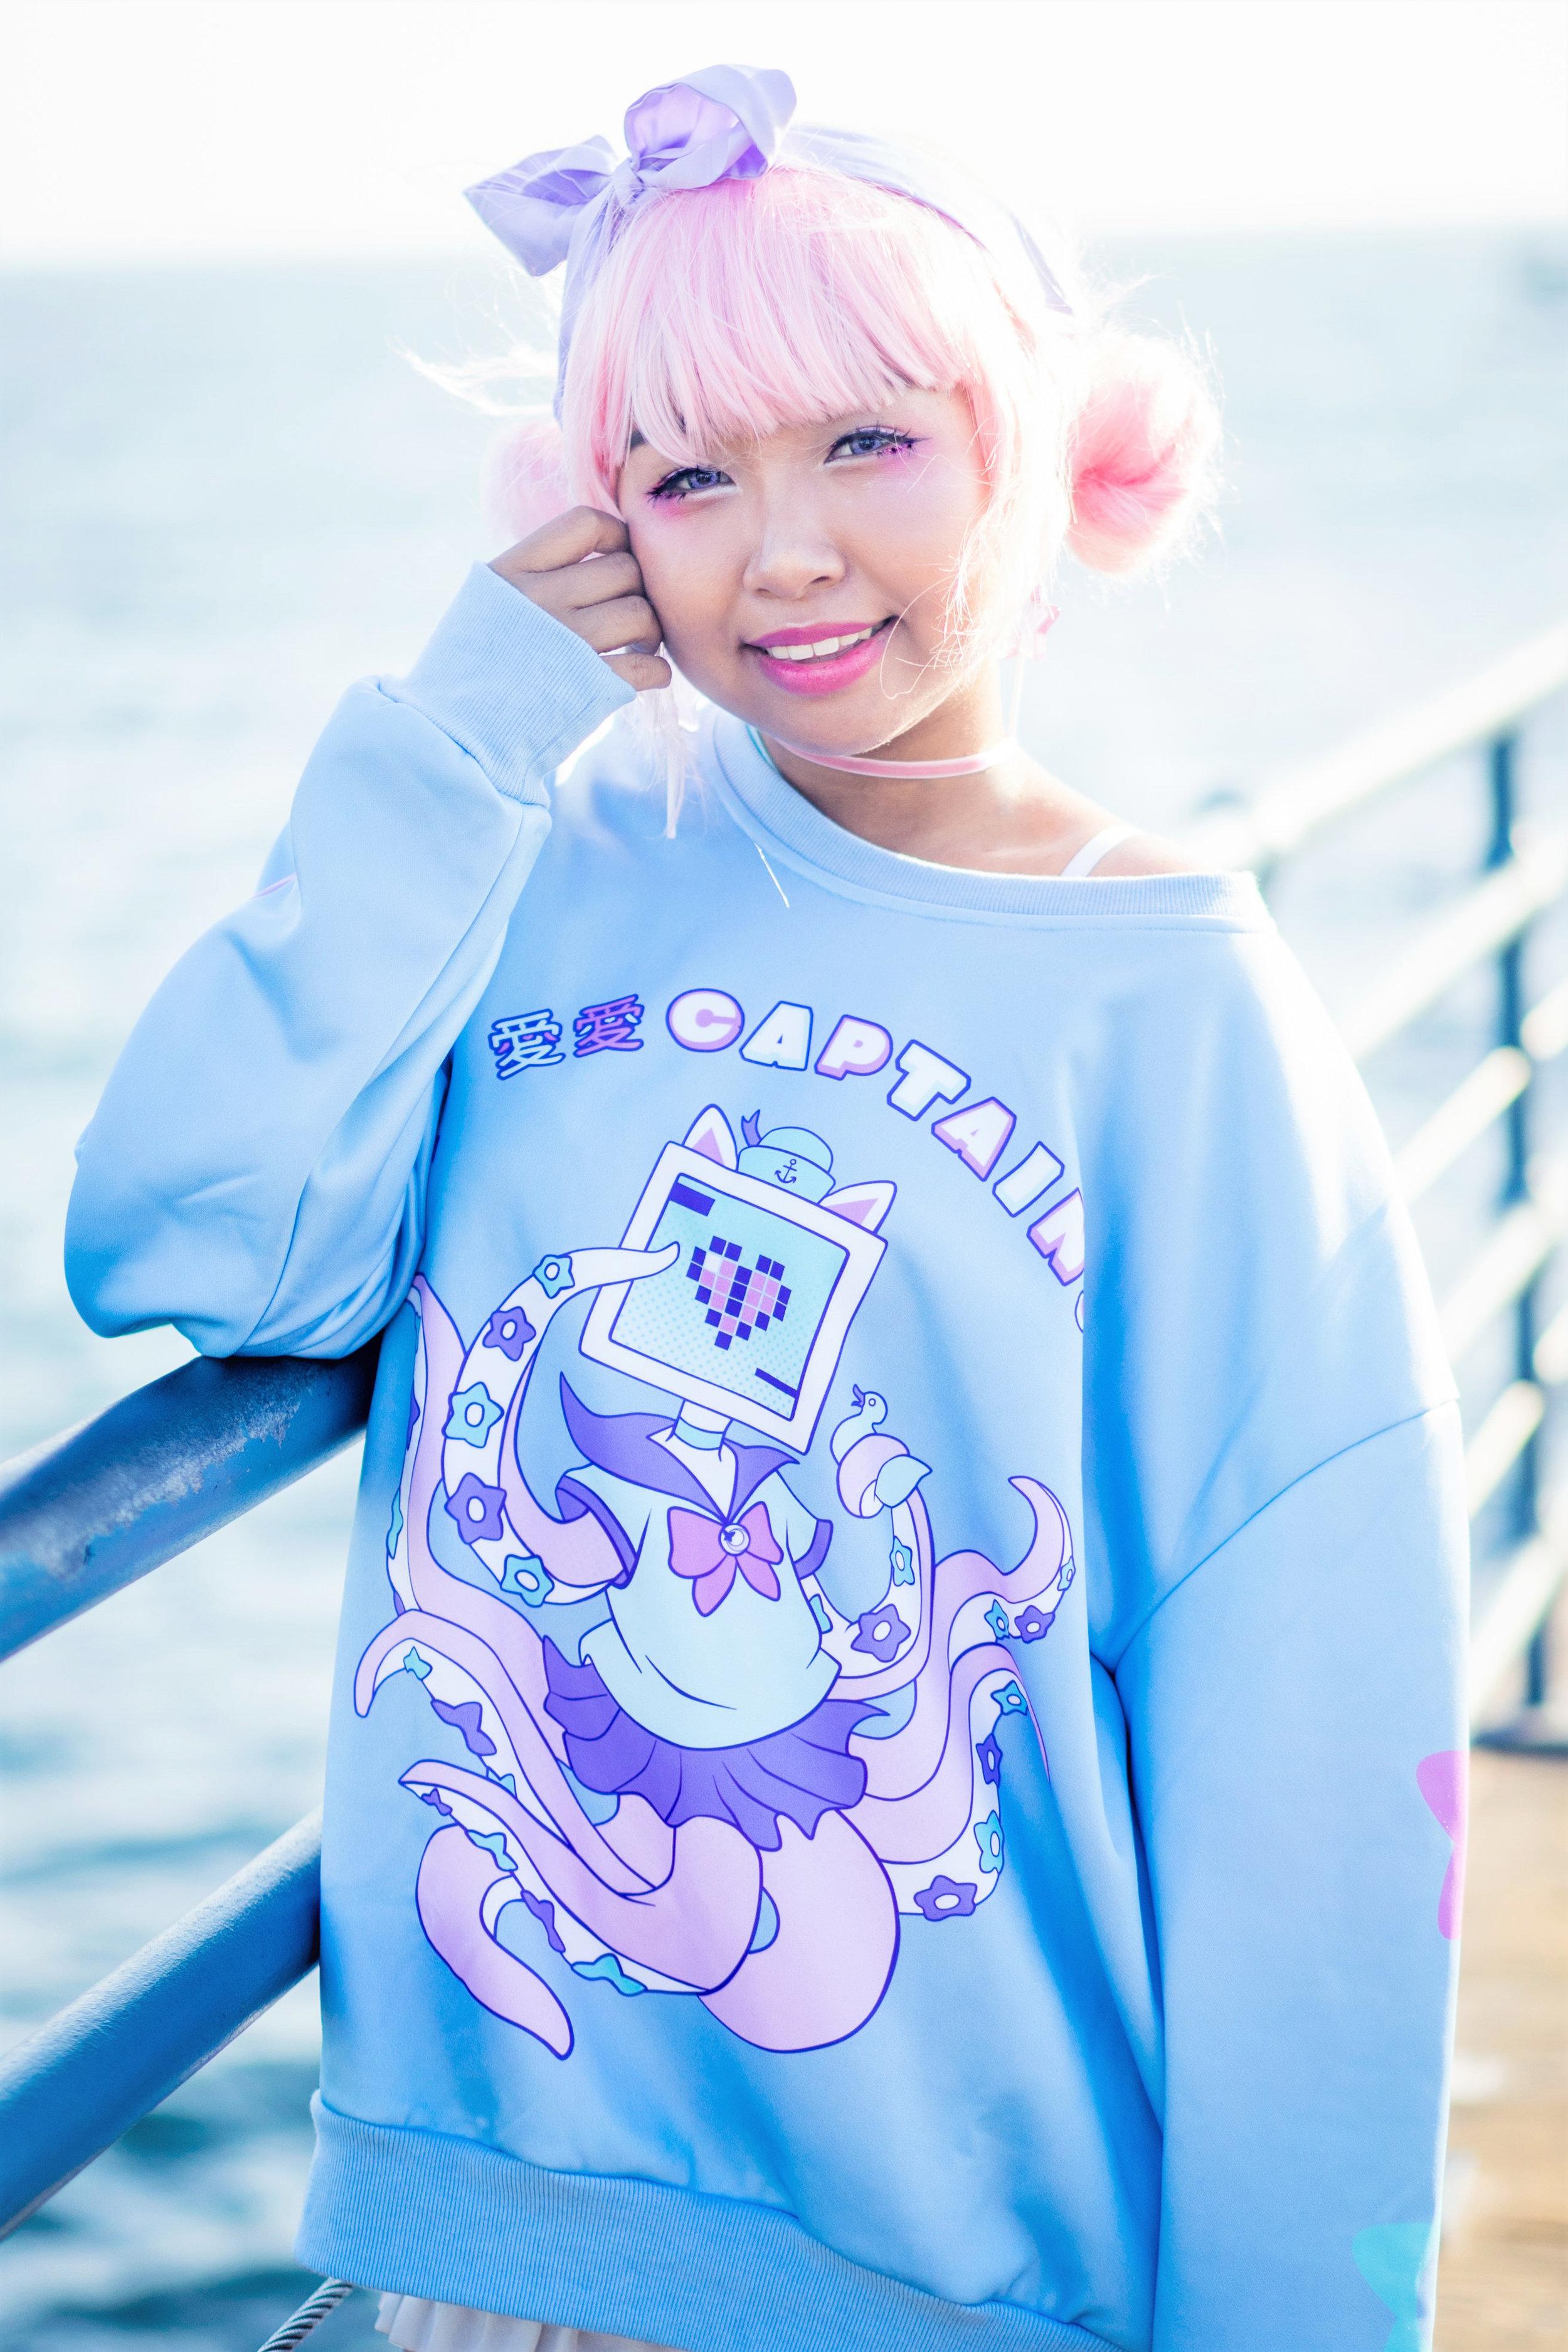 Sweet Cotton Candy Sailor mate